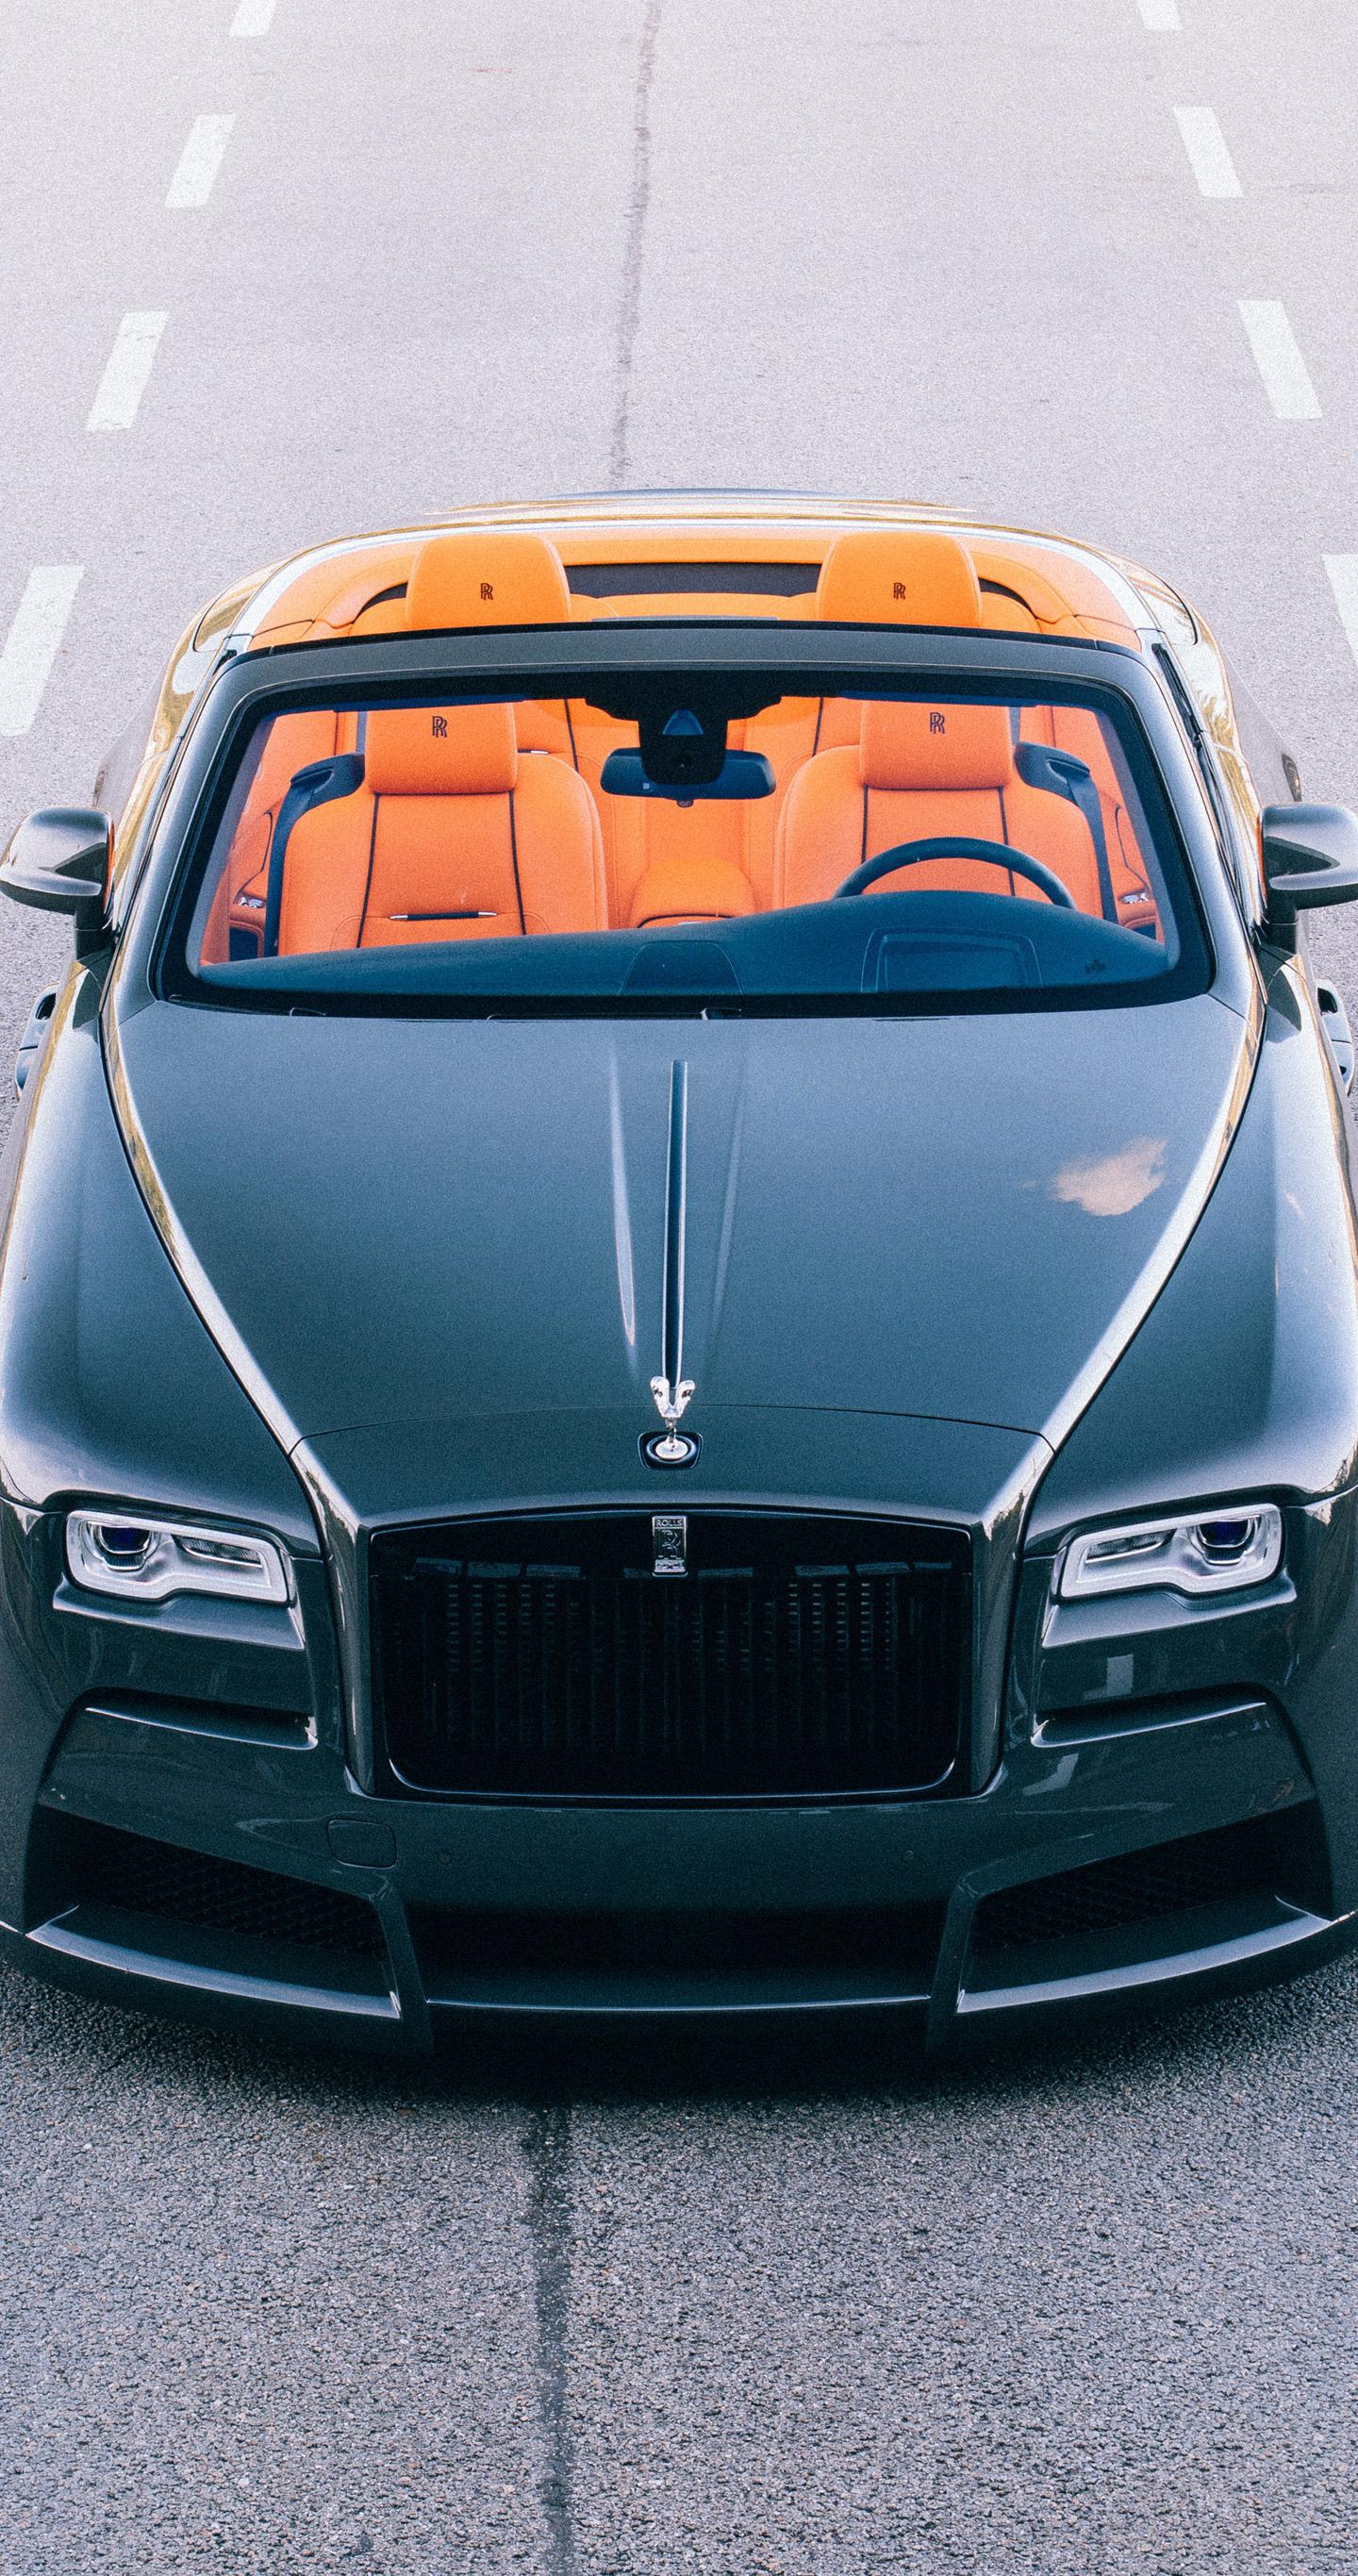 2017 spofec Rolls-Royce Dawn overdose, front view, 1440x2880 wallpaper